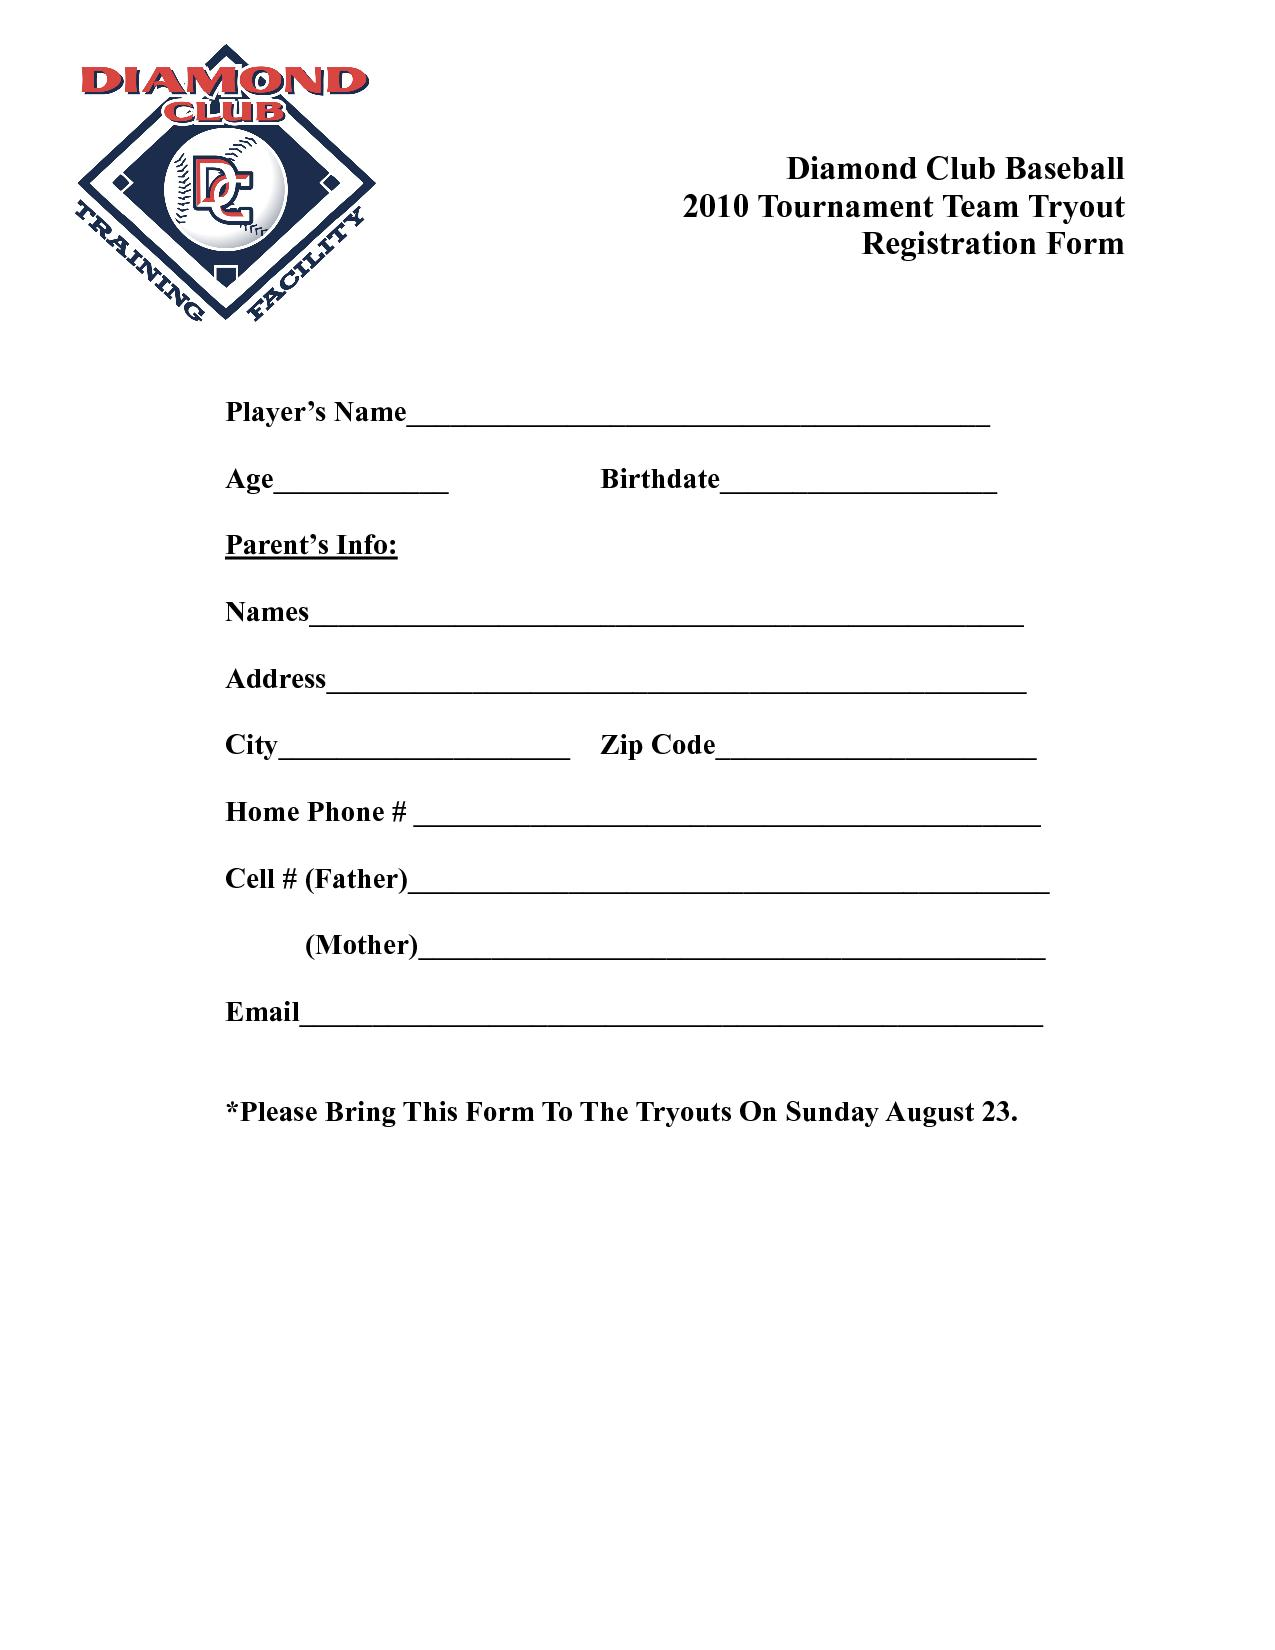 Baseball Tournament Registration Form Template